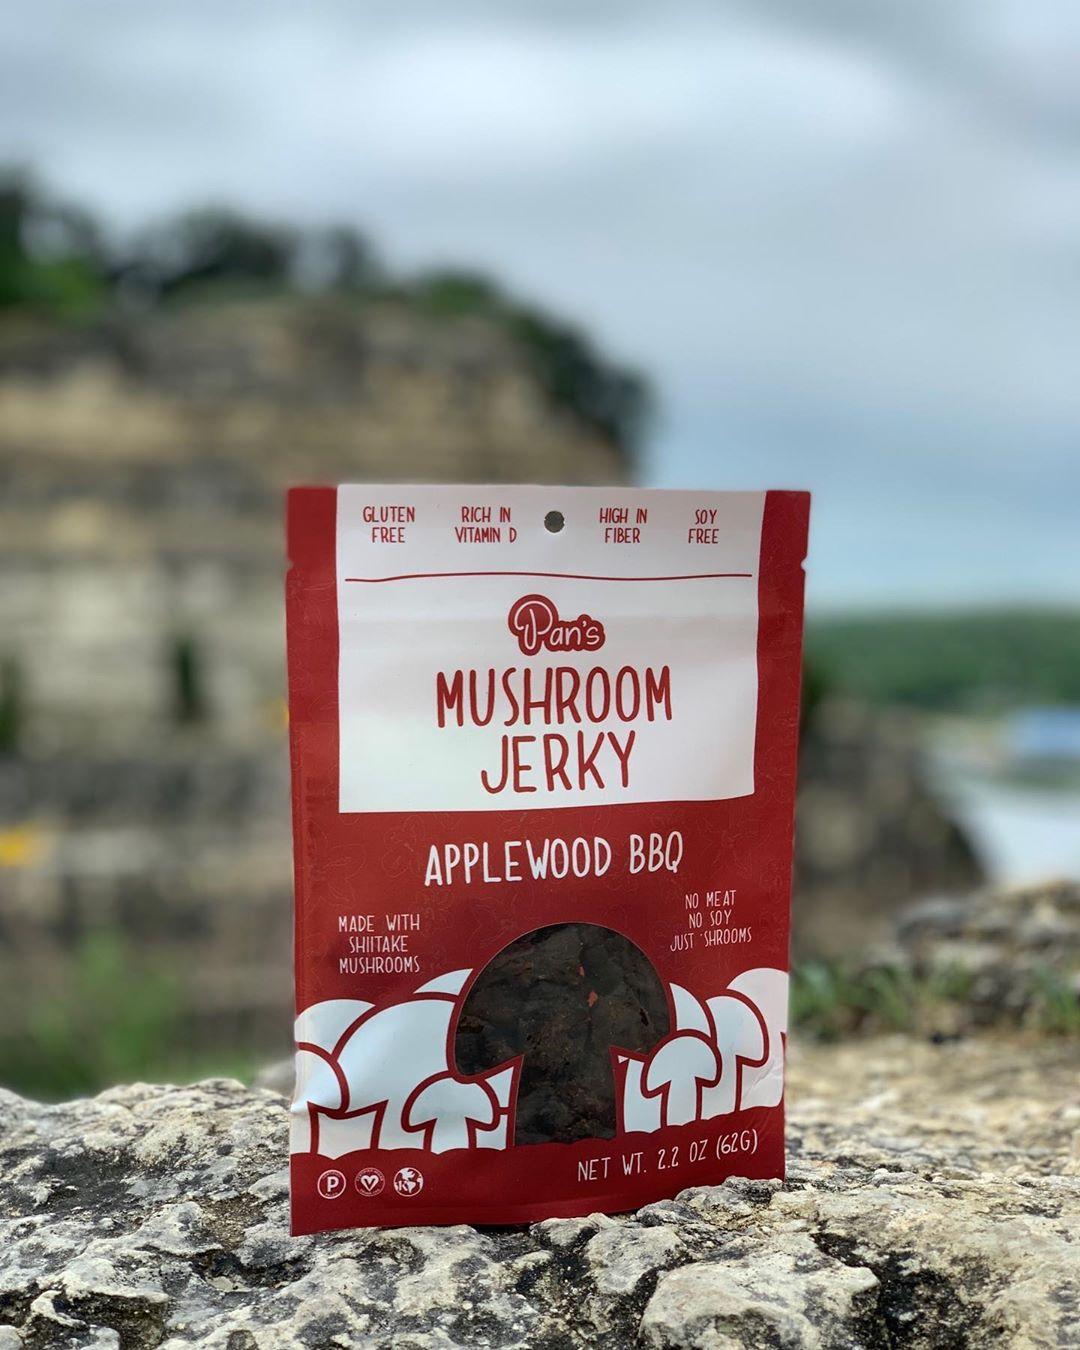 Applewood Mushroom Jerky by Pan's Stuffed mushrooms